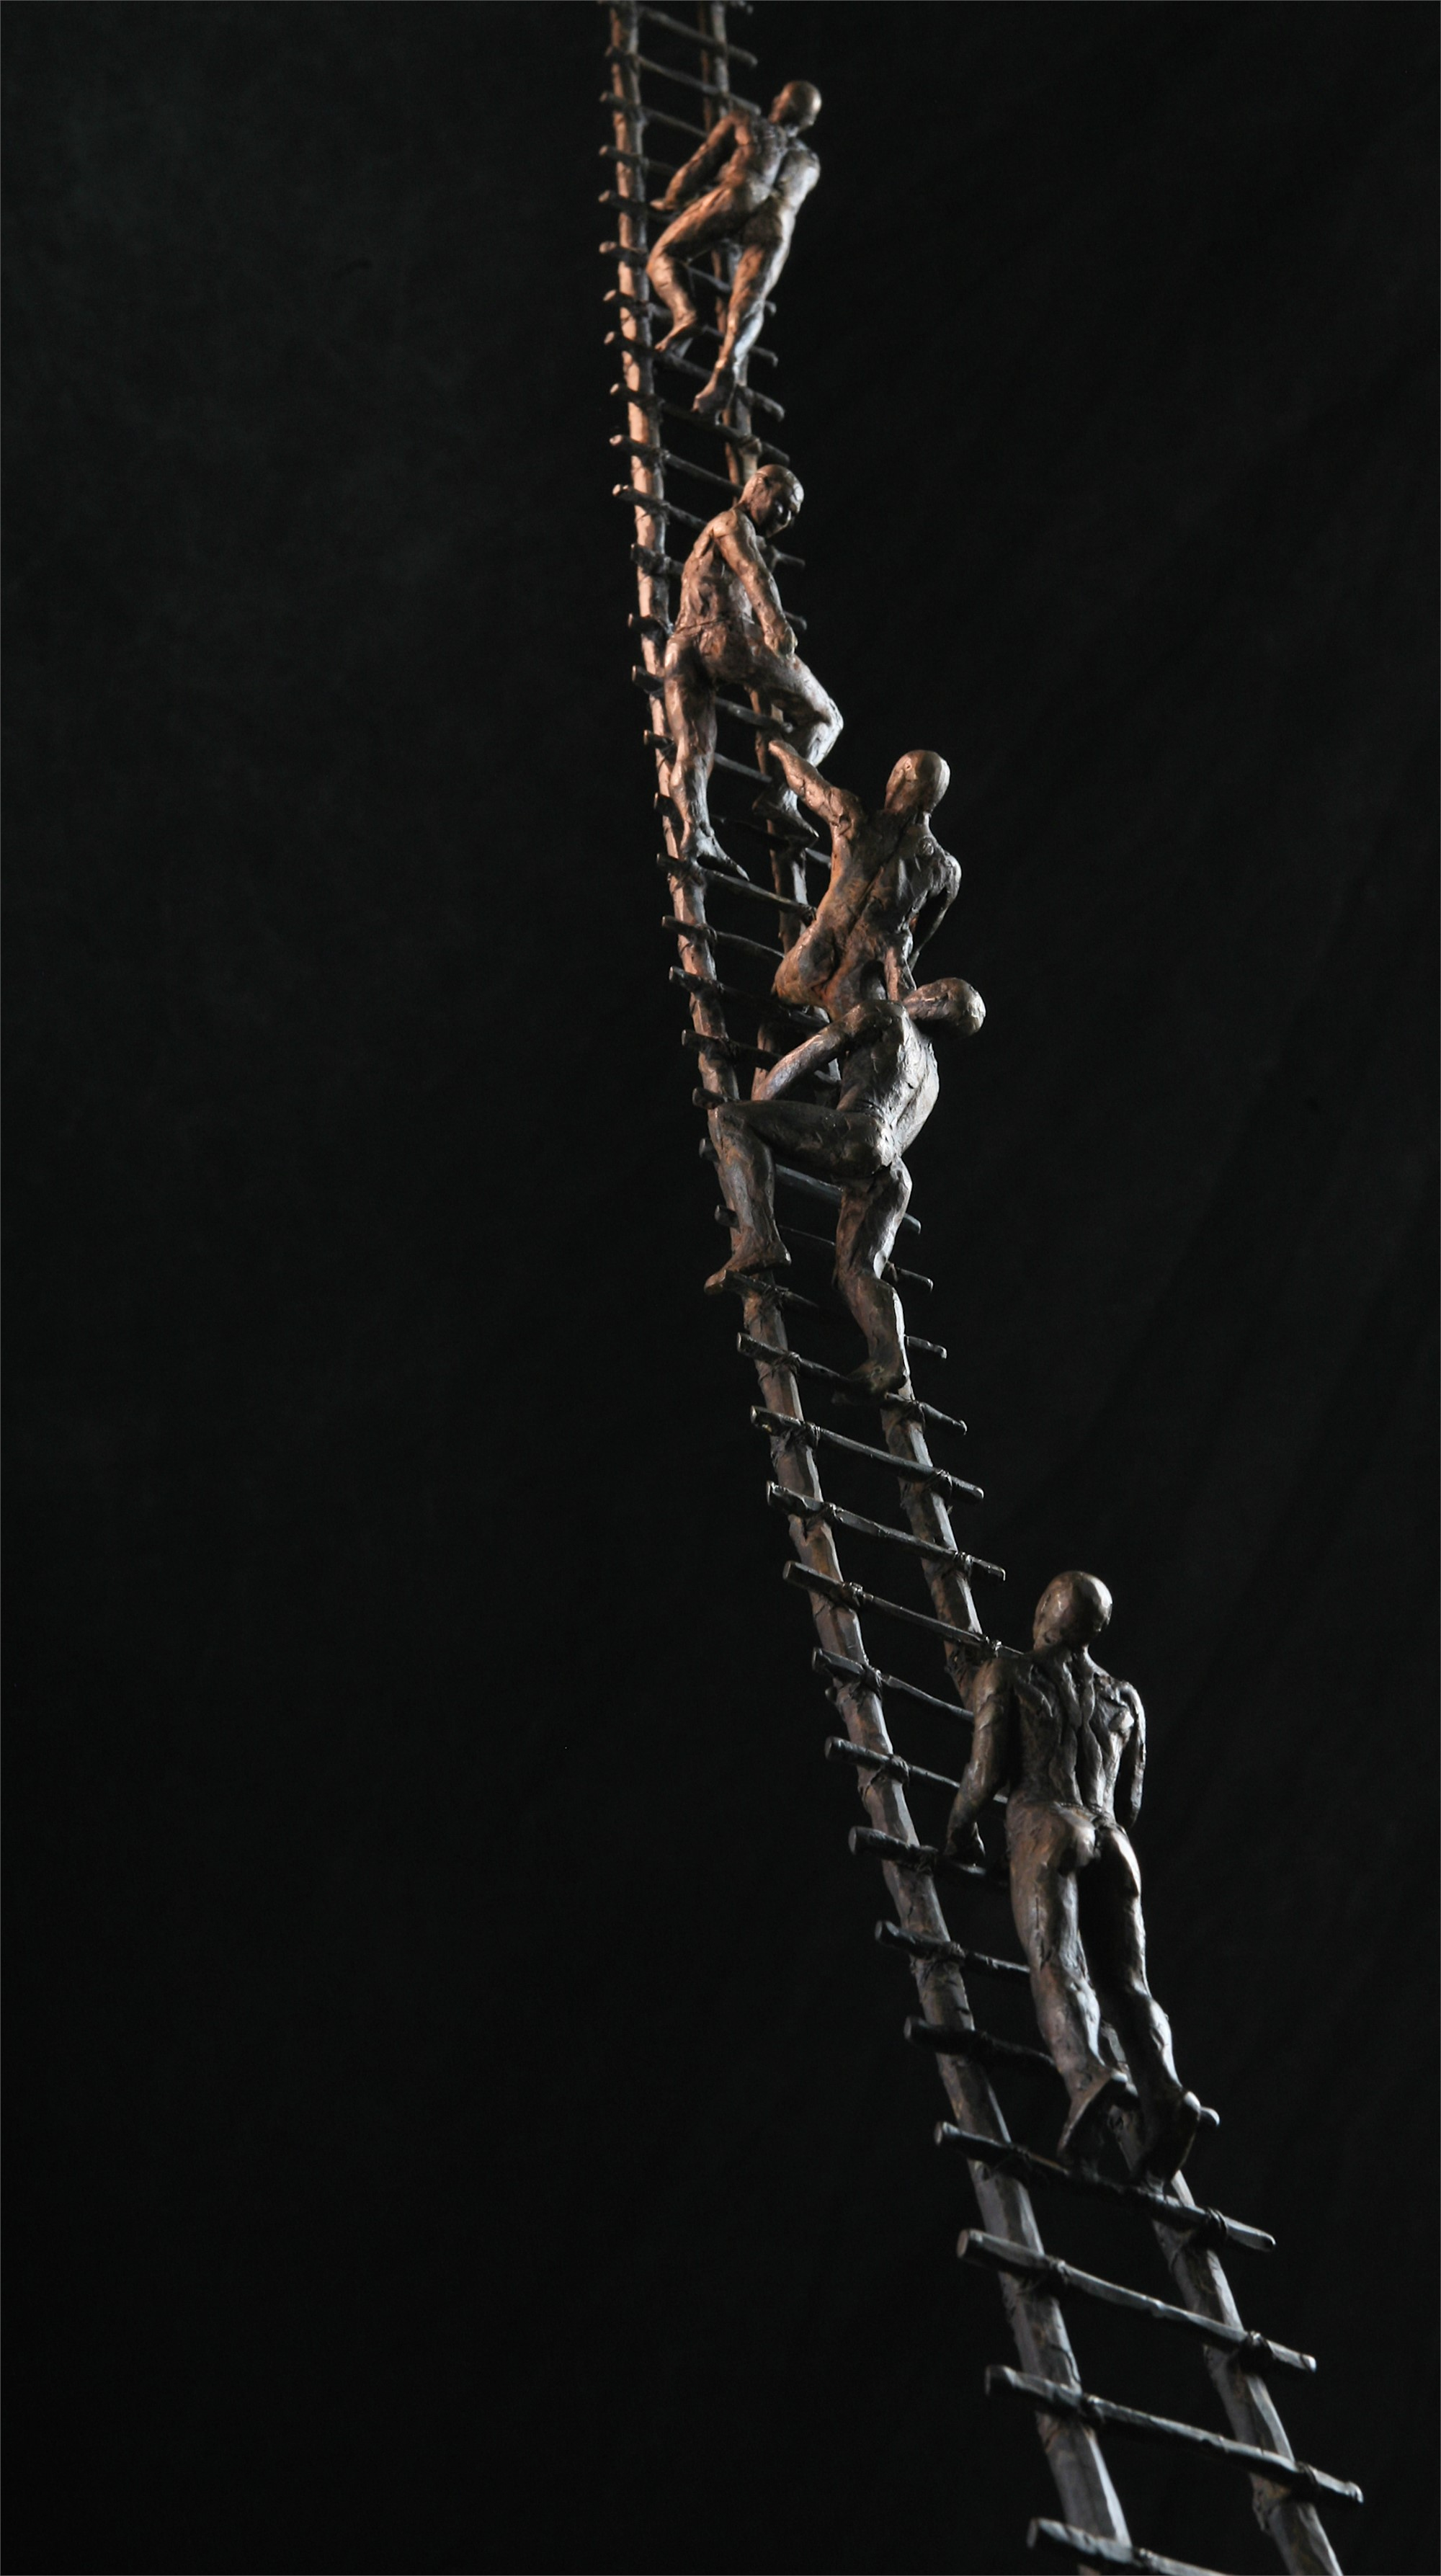 Climbers: The Ladder II by Bill Starke